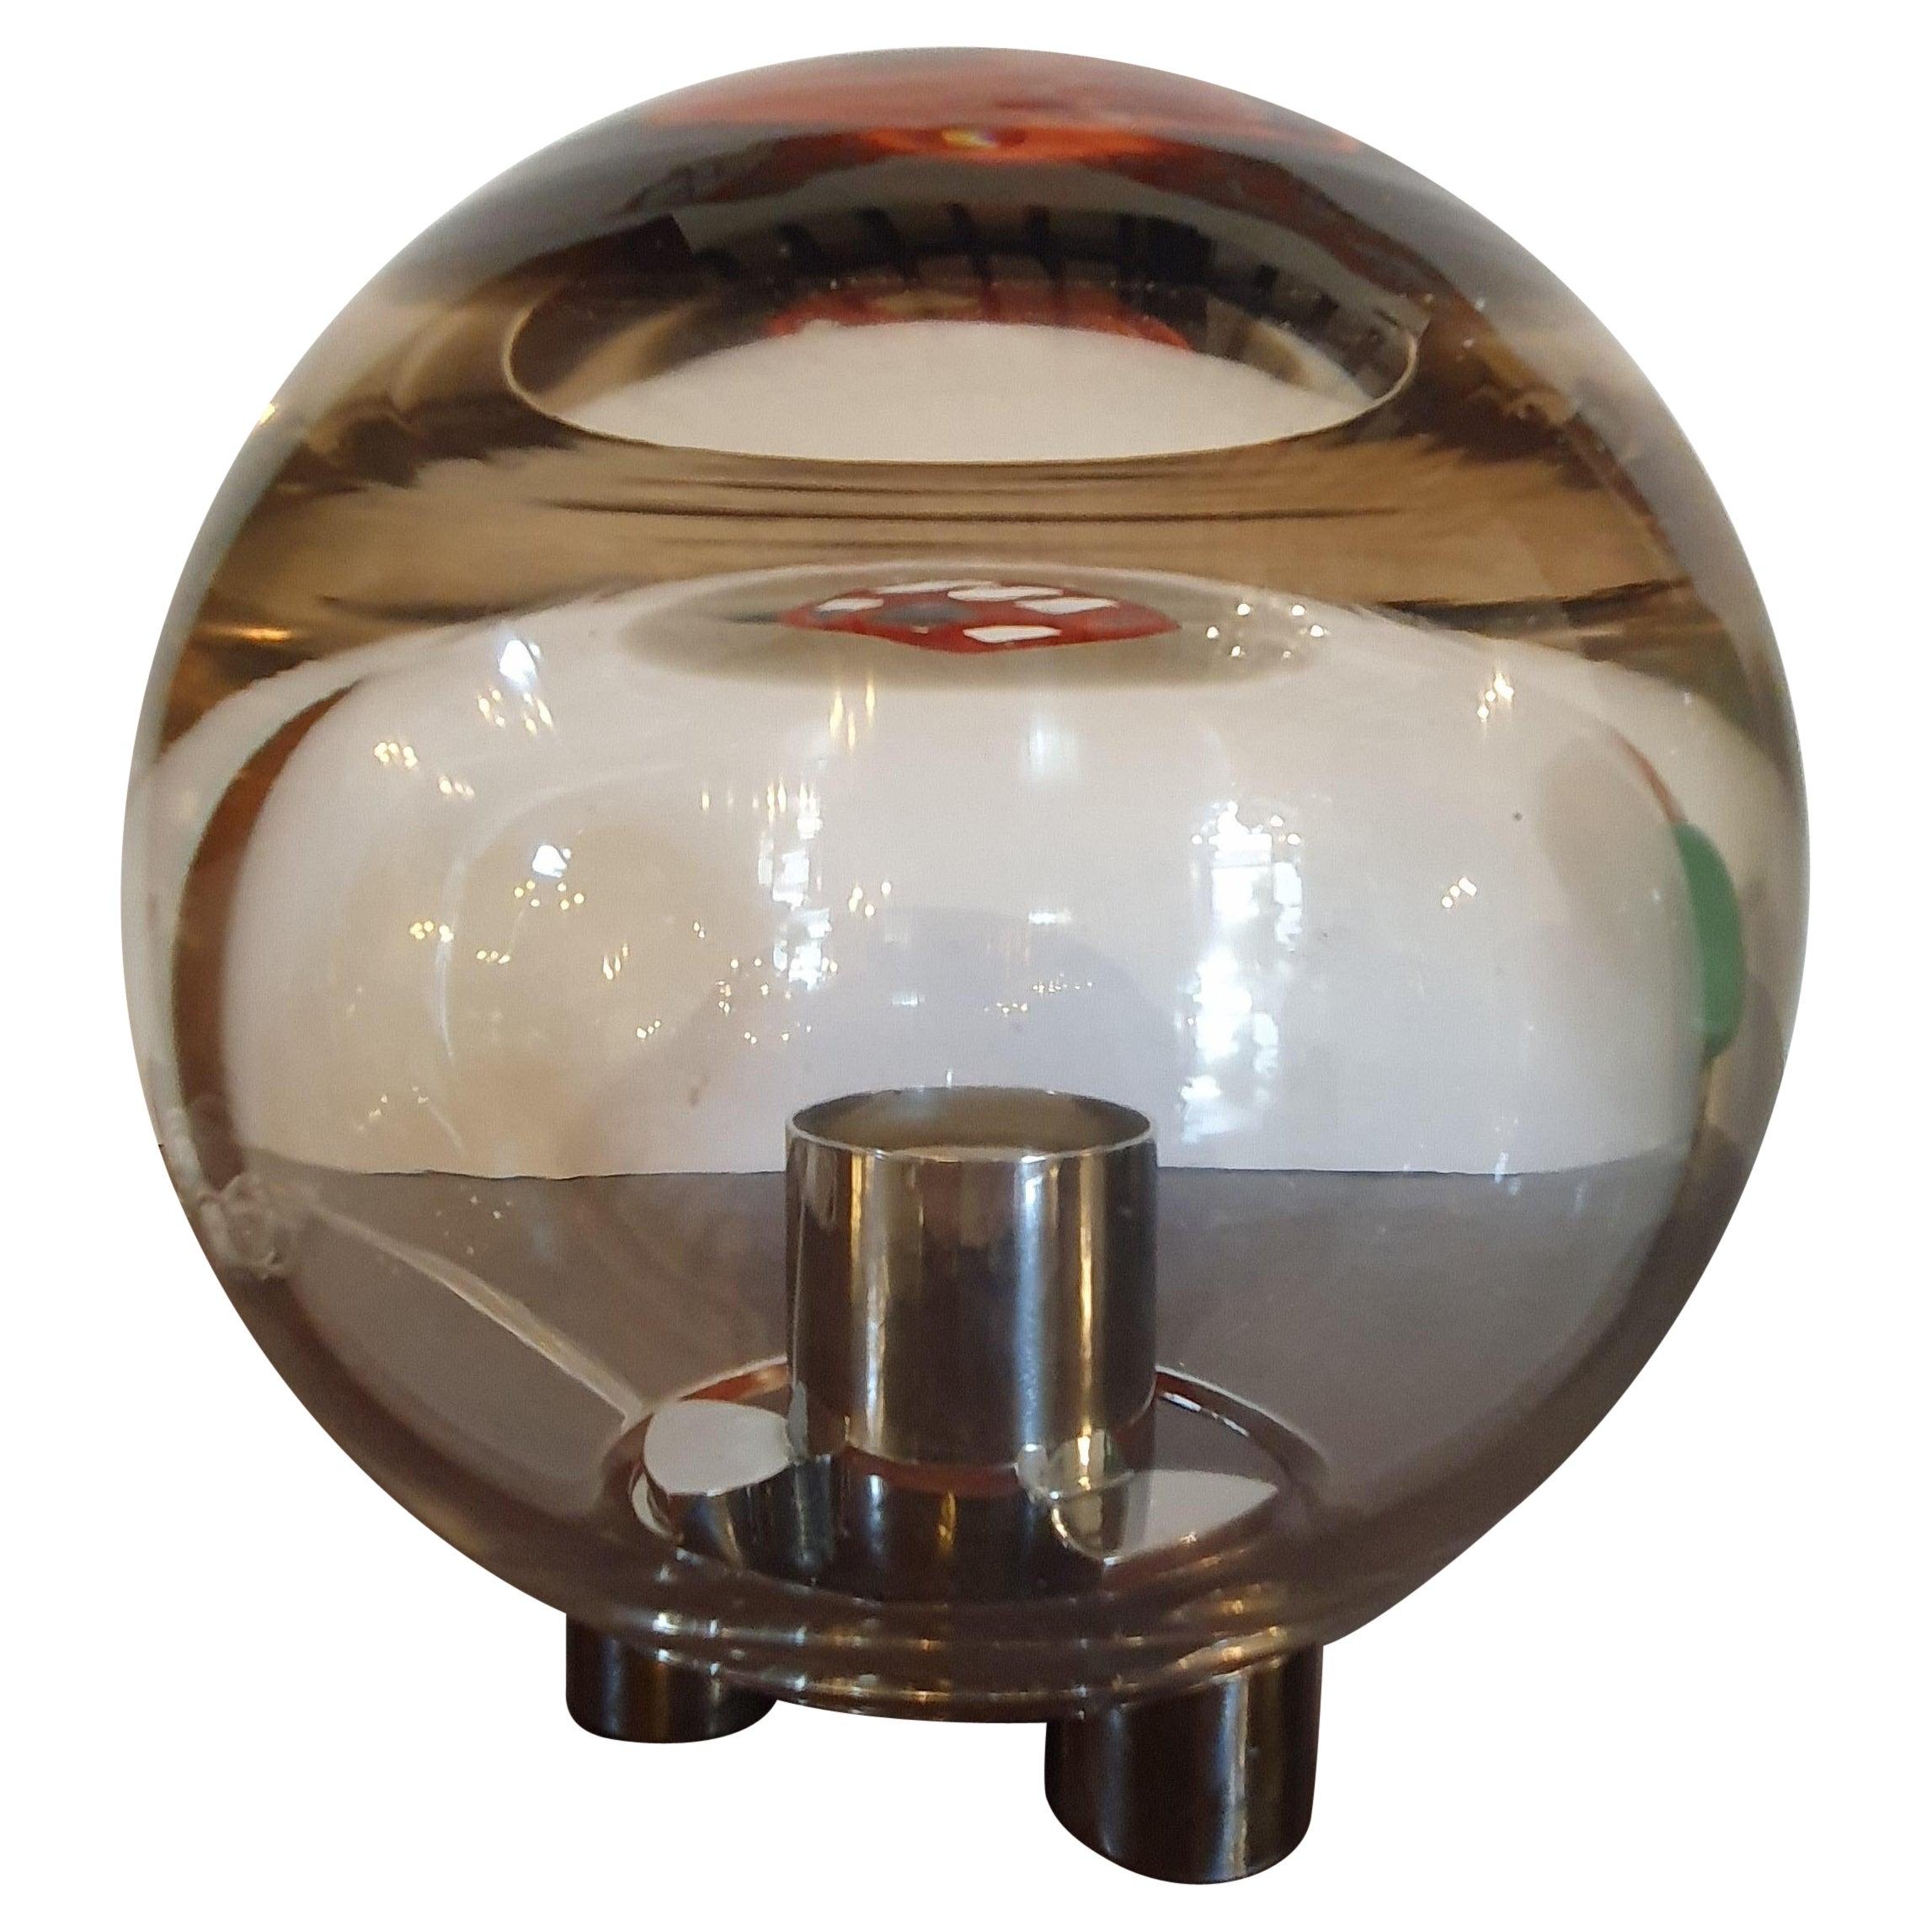 20th Century Venini Murano Blown Glass Table Lamp, Italy, 1976